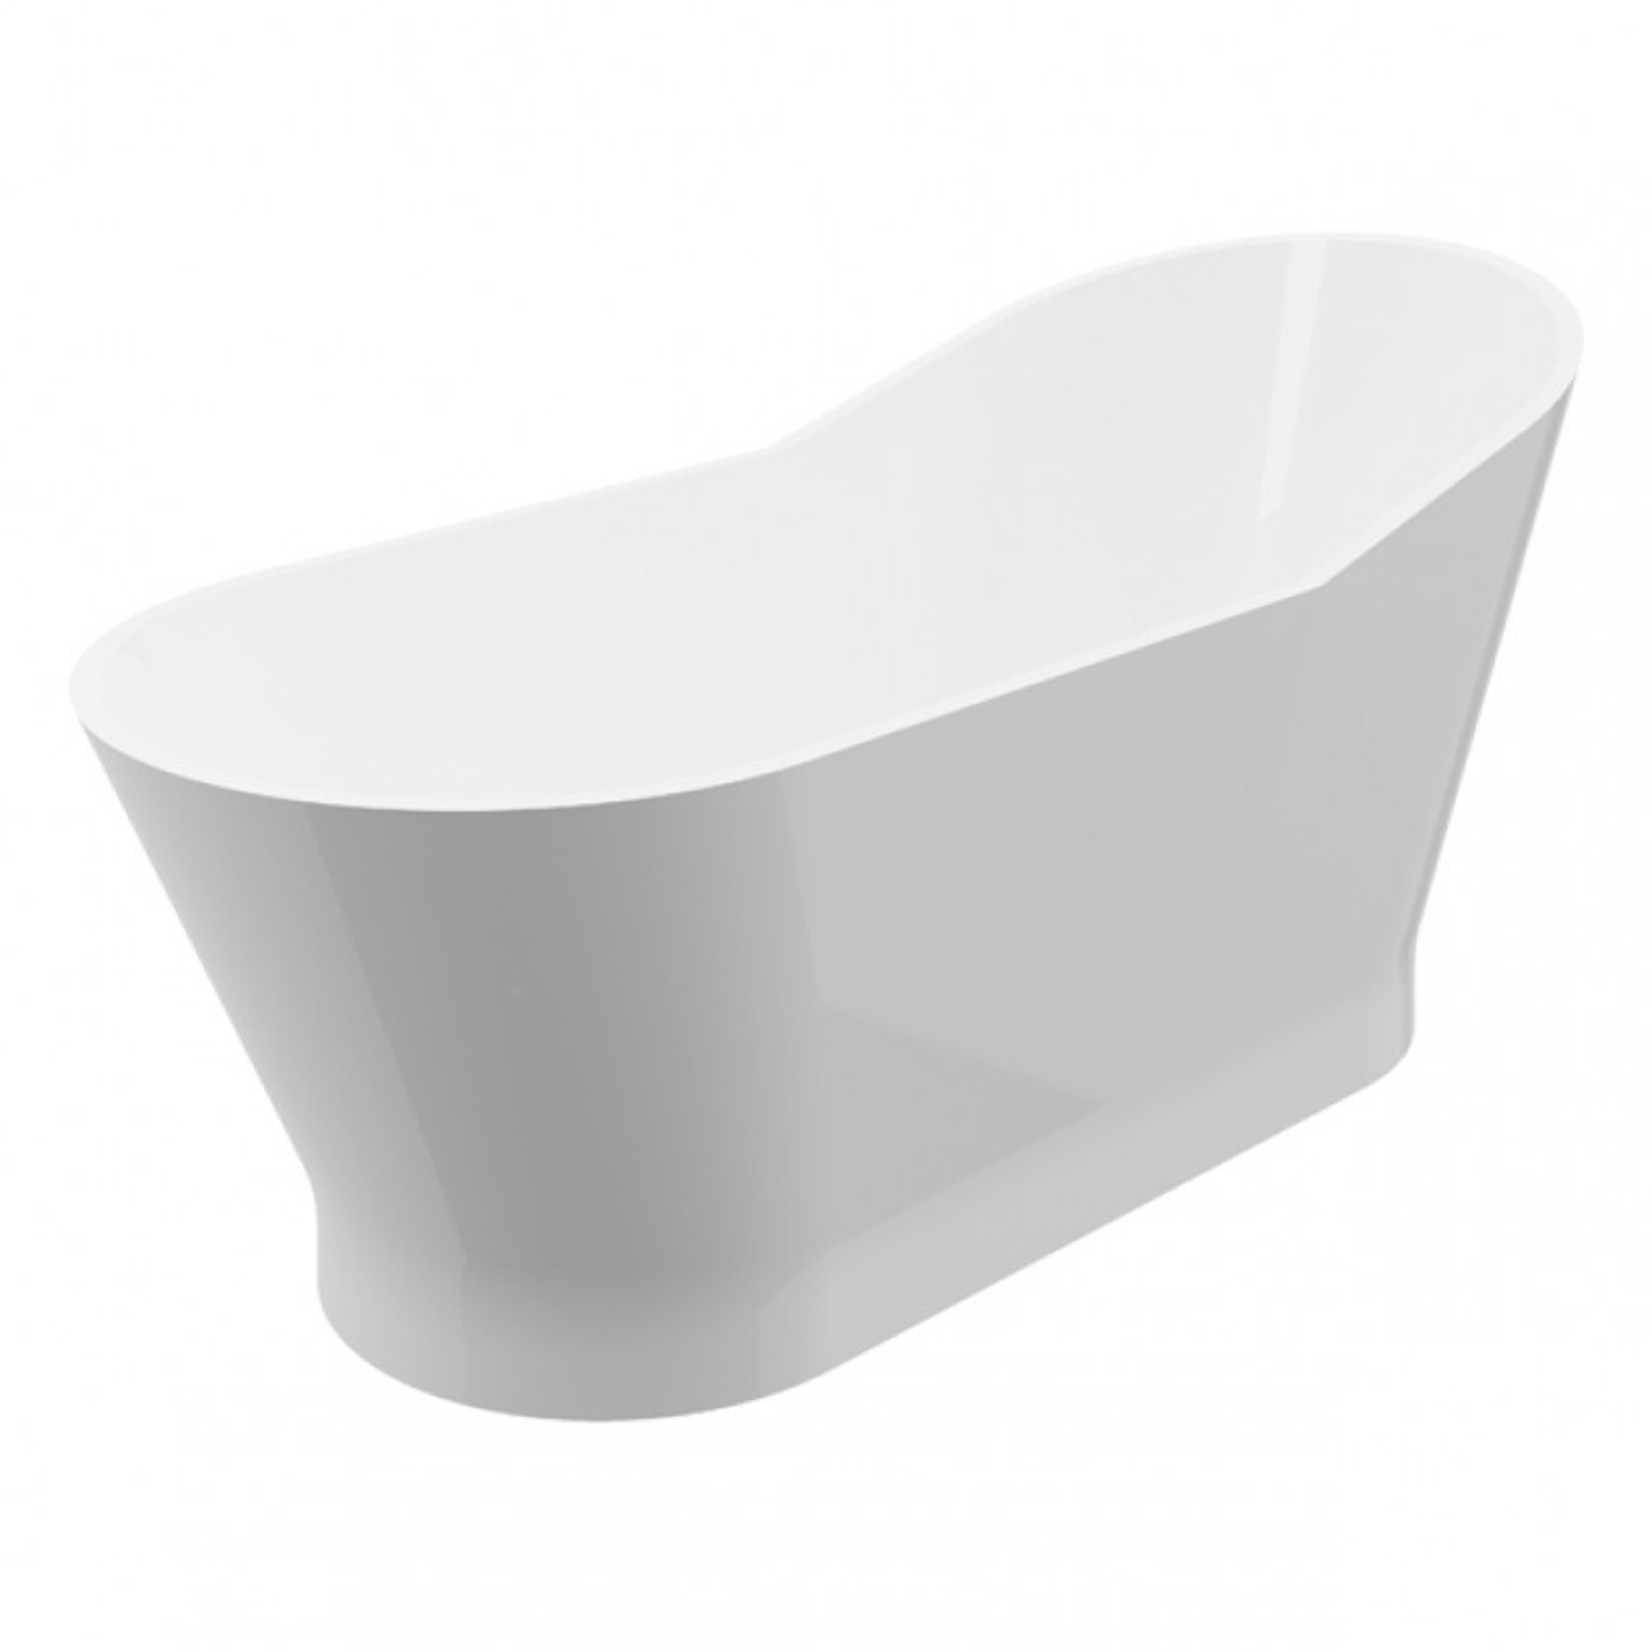 Deluxe Freestanding Bathtub Iris-59